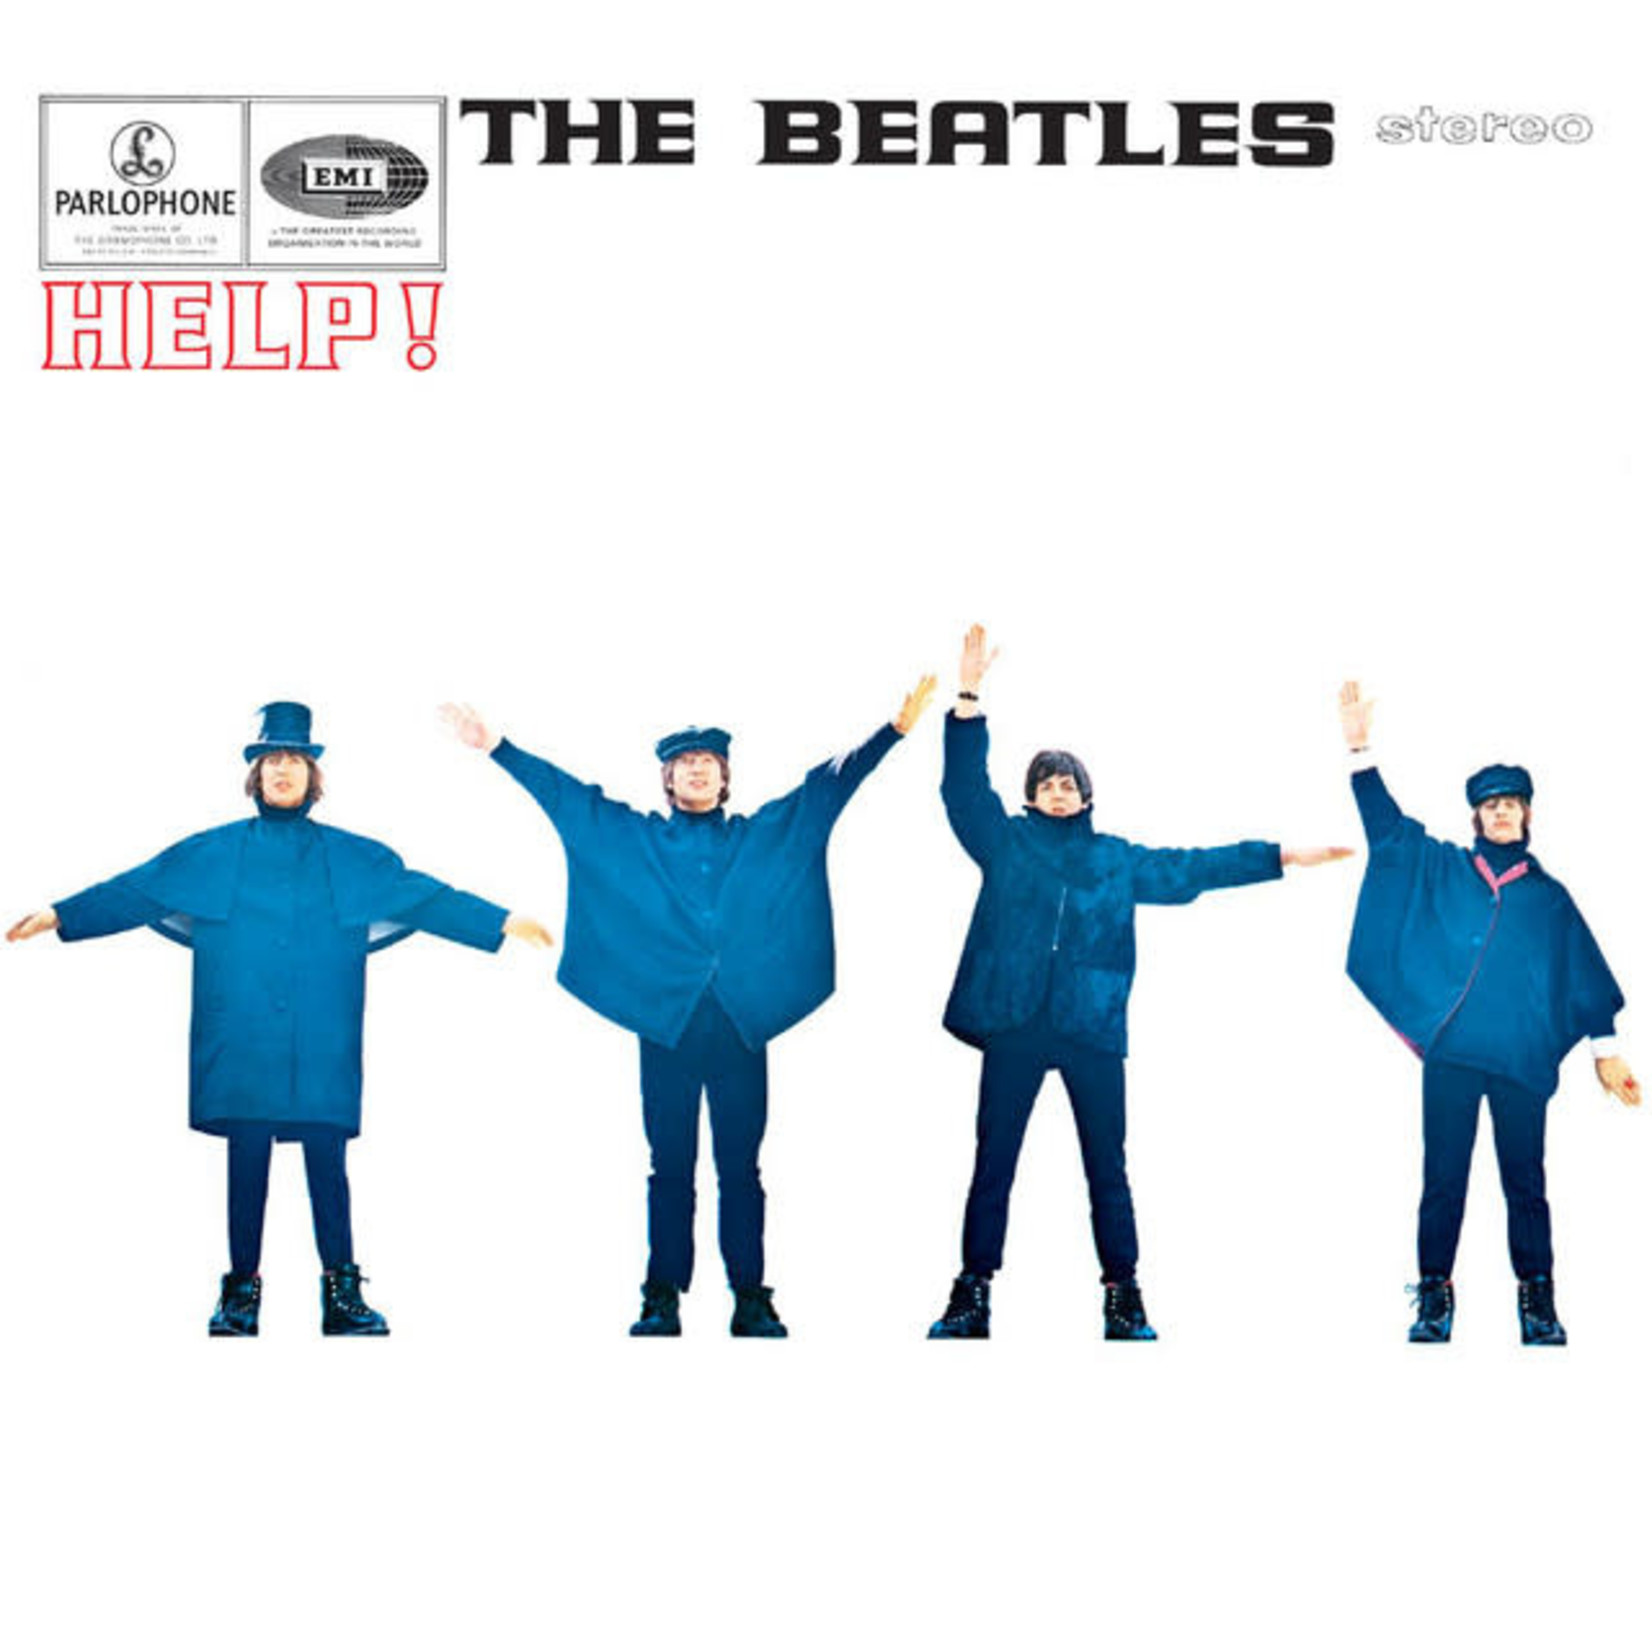 Vinyl The Beatles - Help